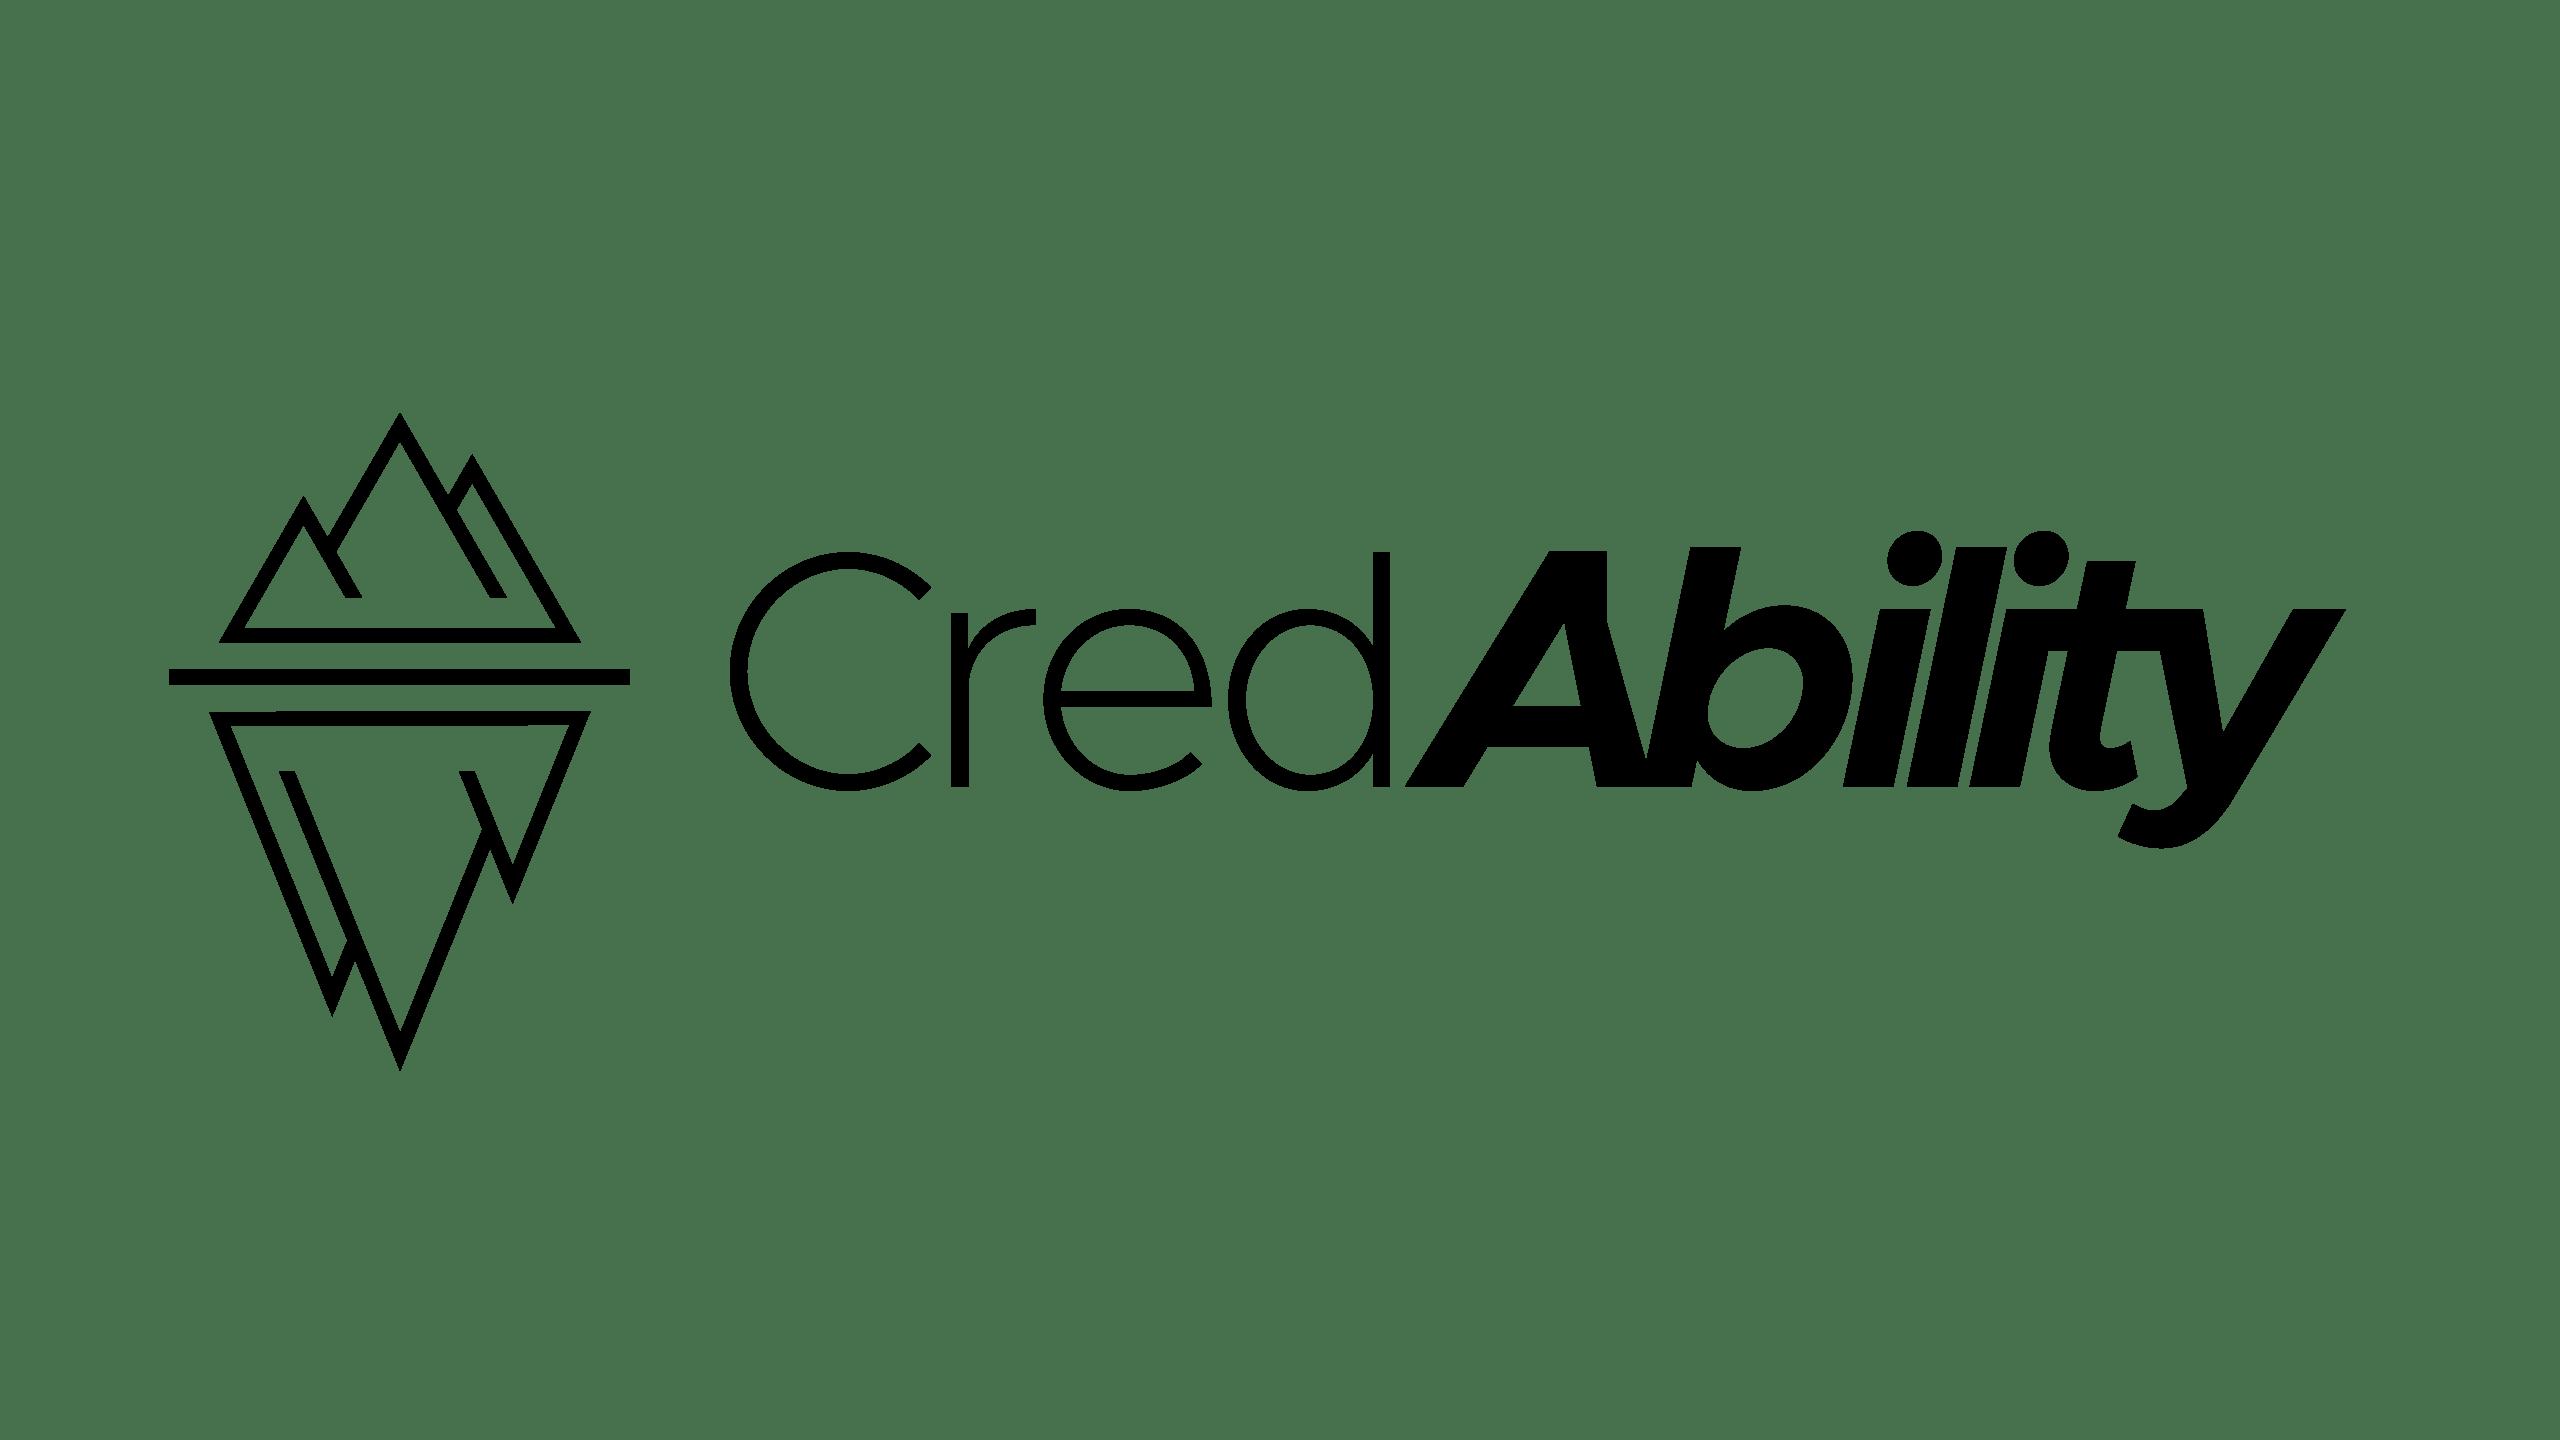 logo 2_CREDABILITY